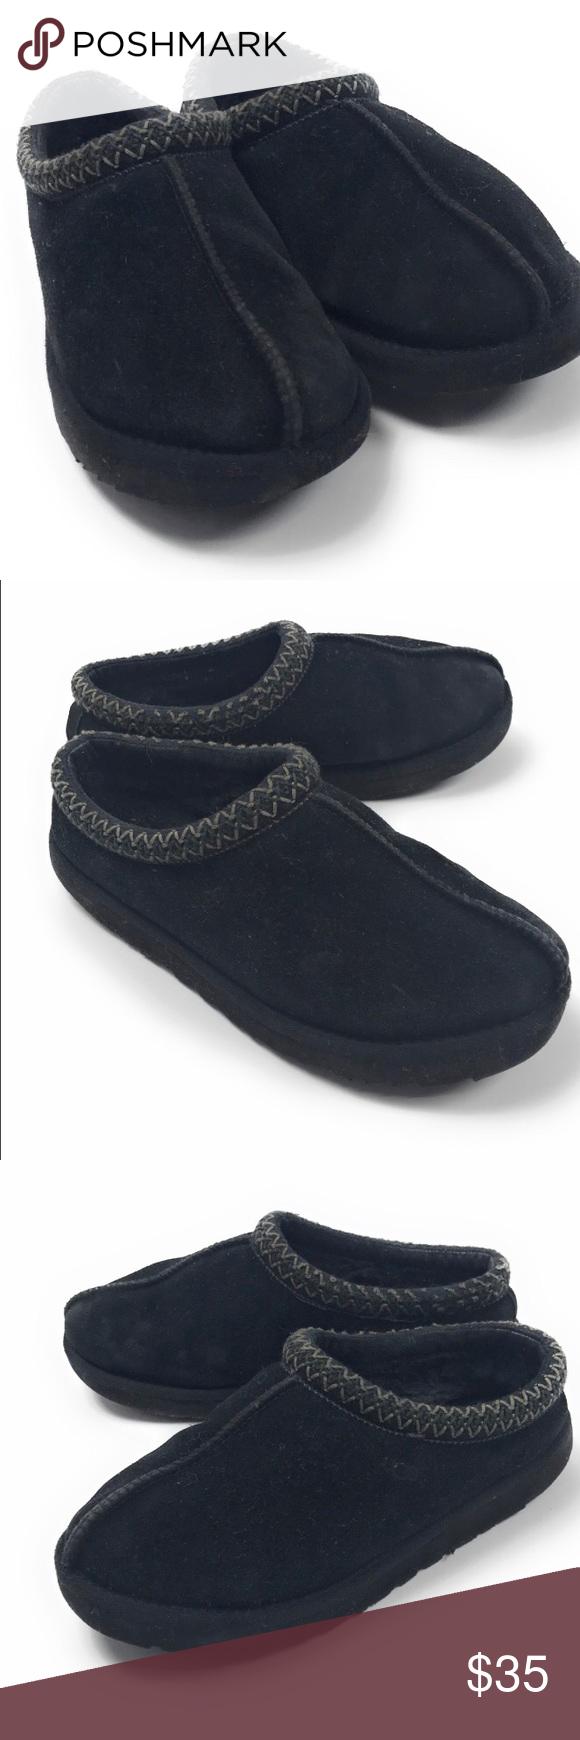 4761fa7961b UGG Women's Black Tasman Slippers Size 8 UGG Australia Women's ...